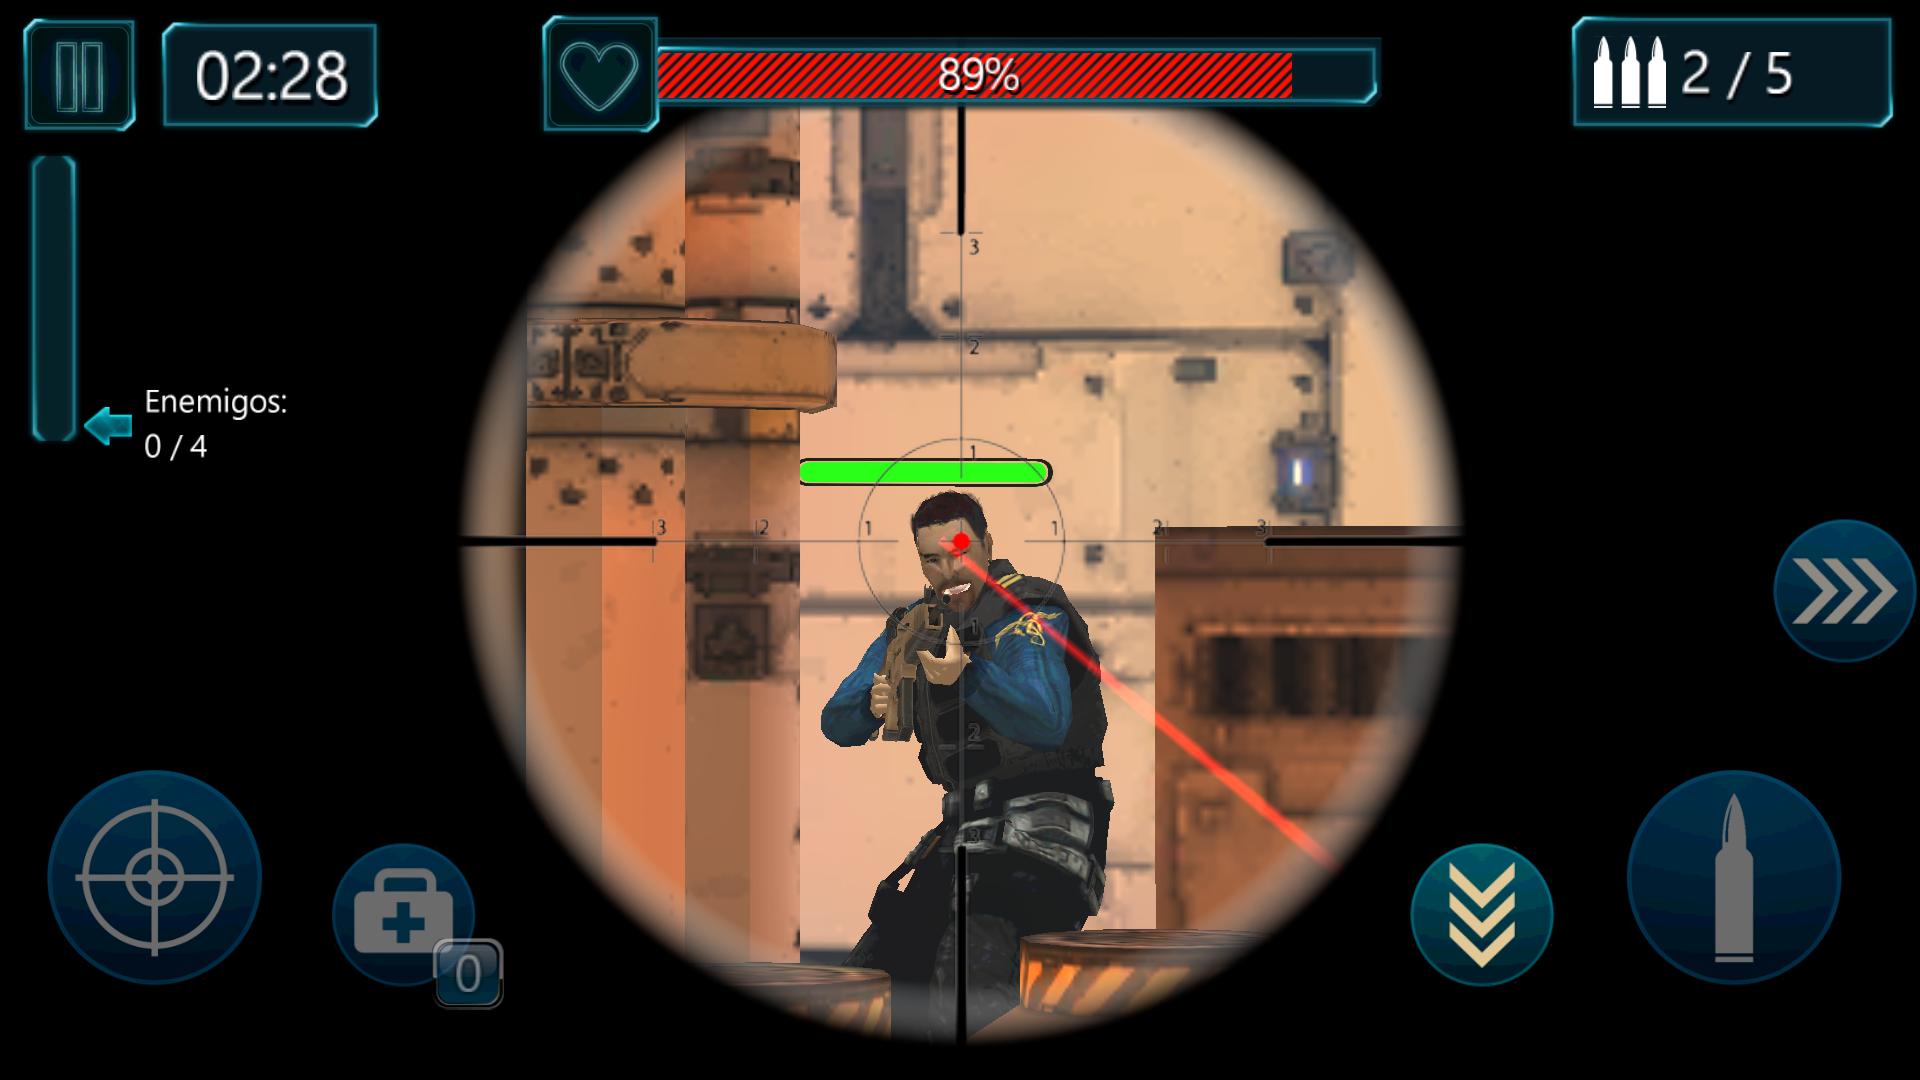 Juego apra android Battlefield Interstellar